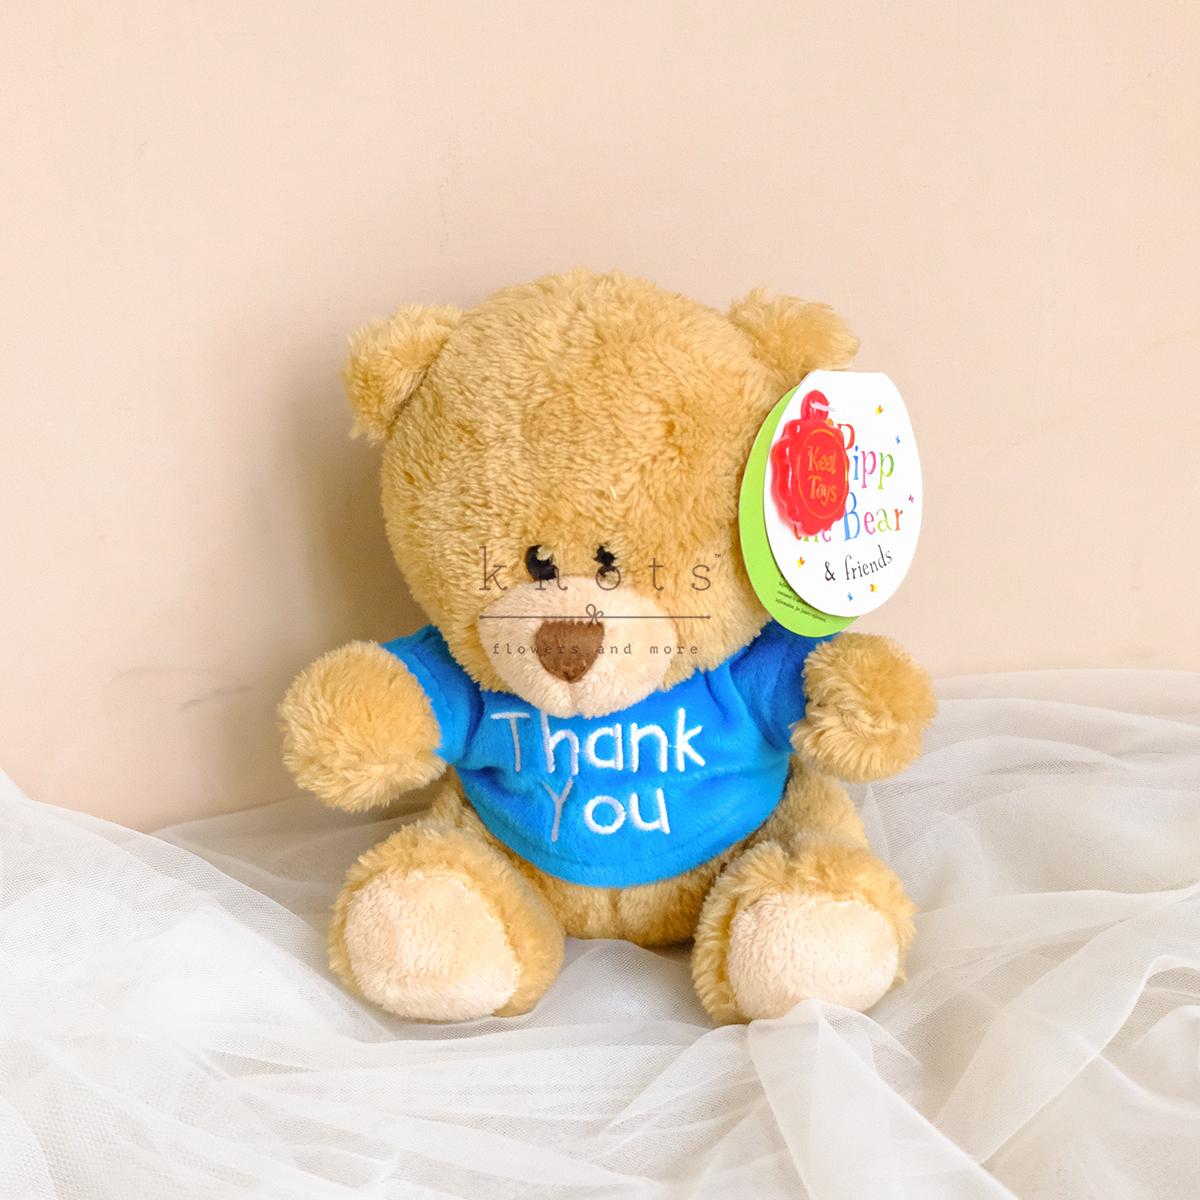 4cm Pippins Bear Thank You Blue